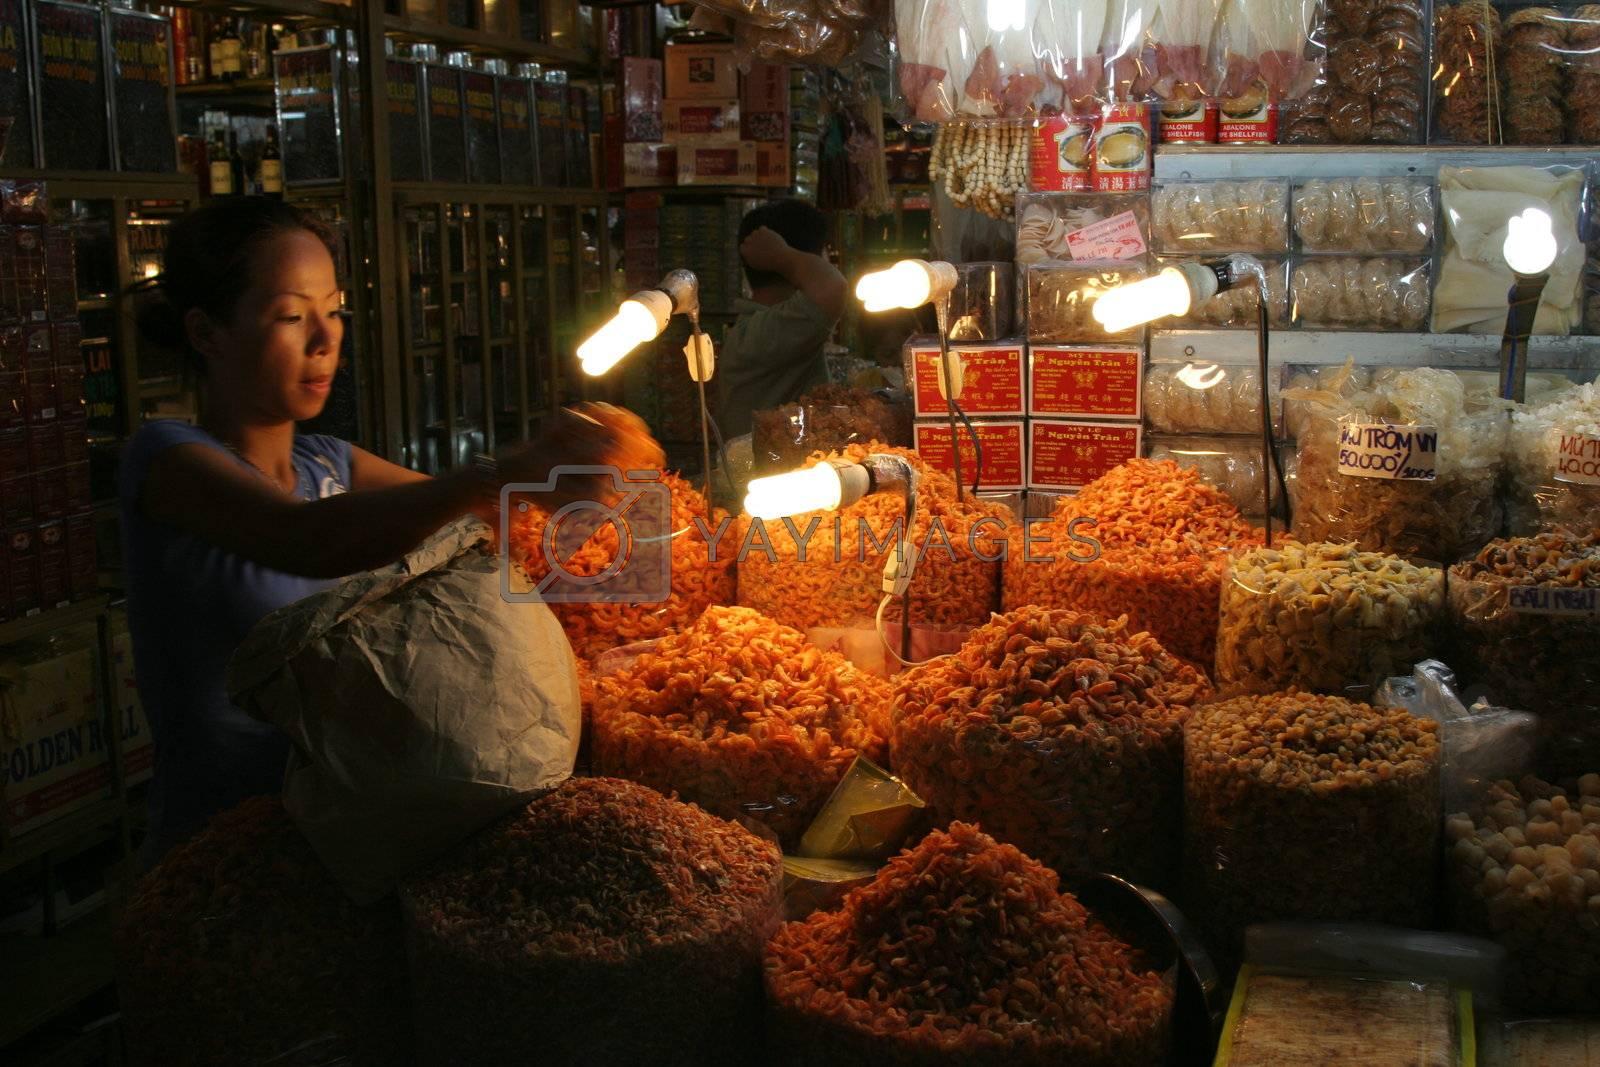 Indoor market in Saigon